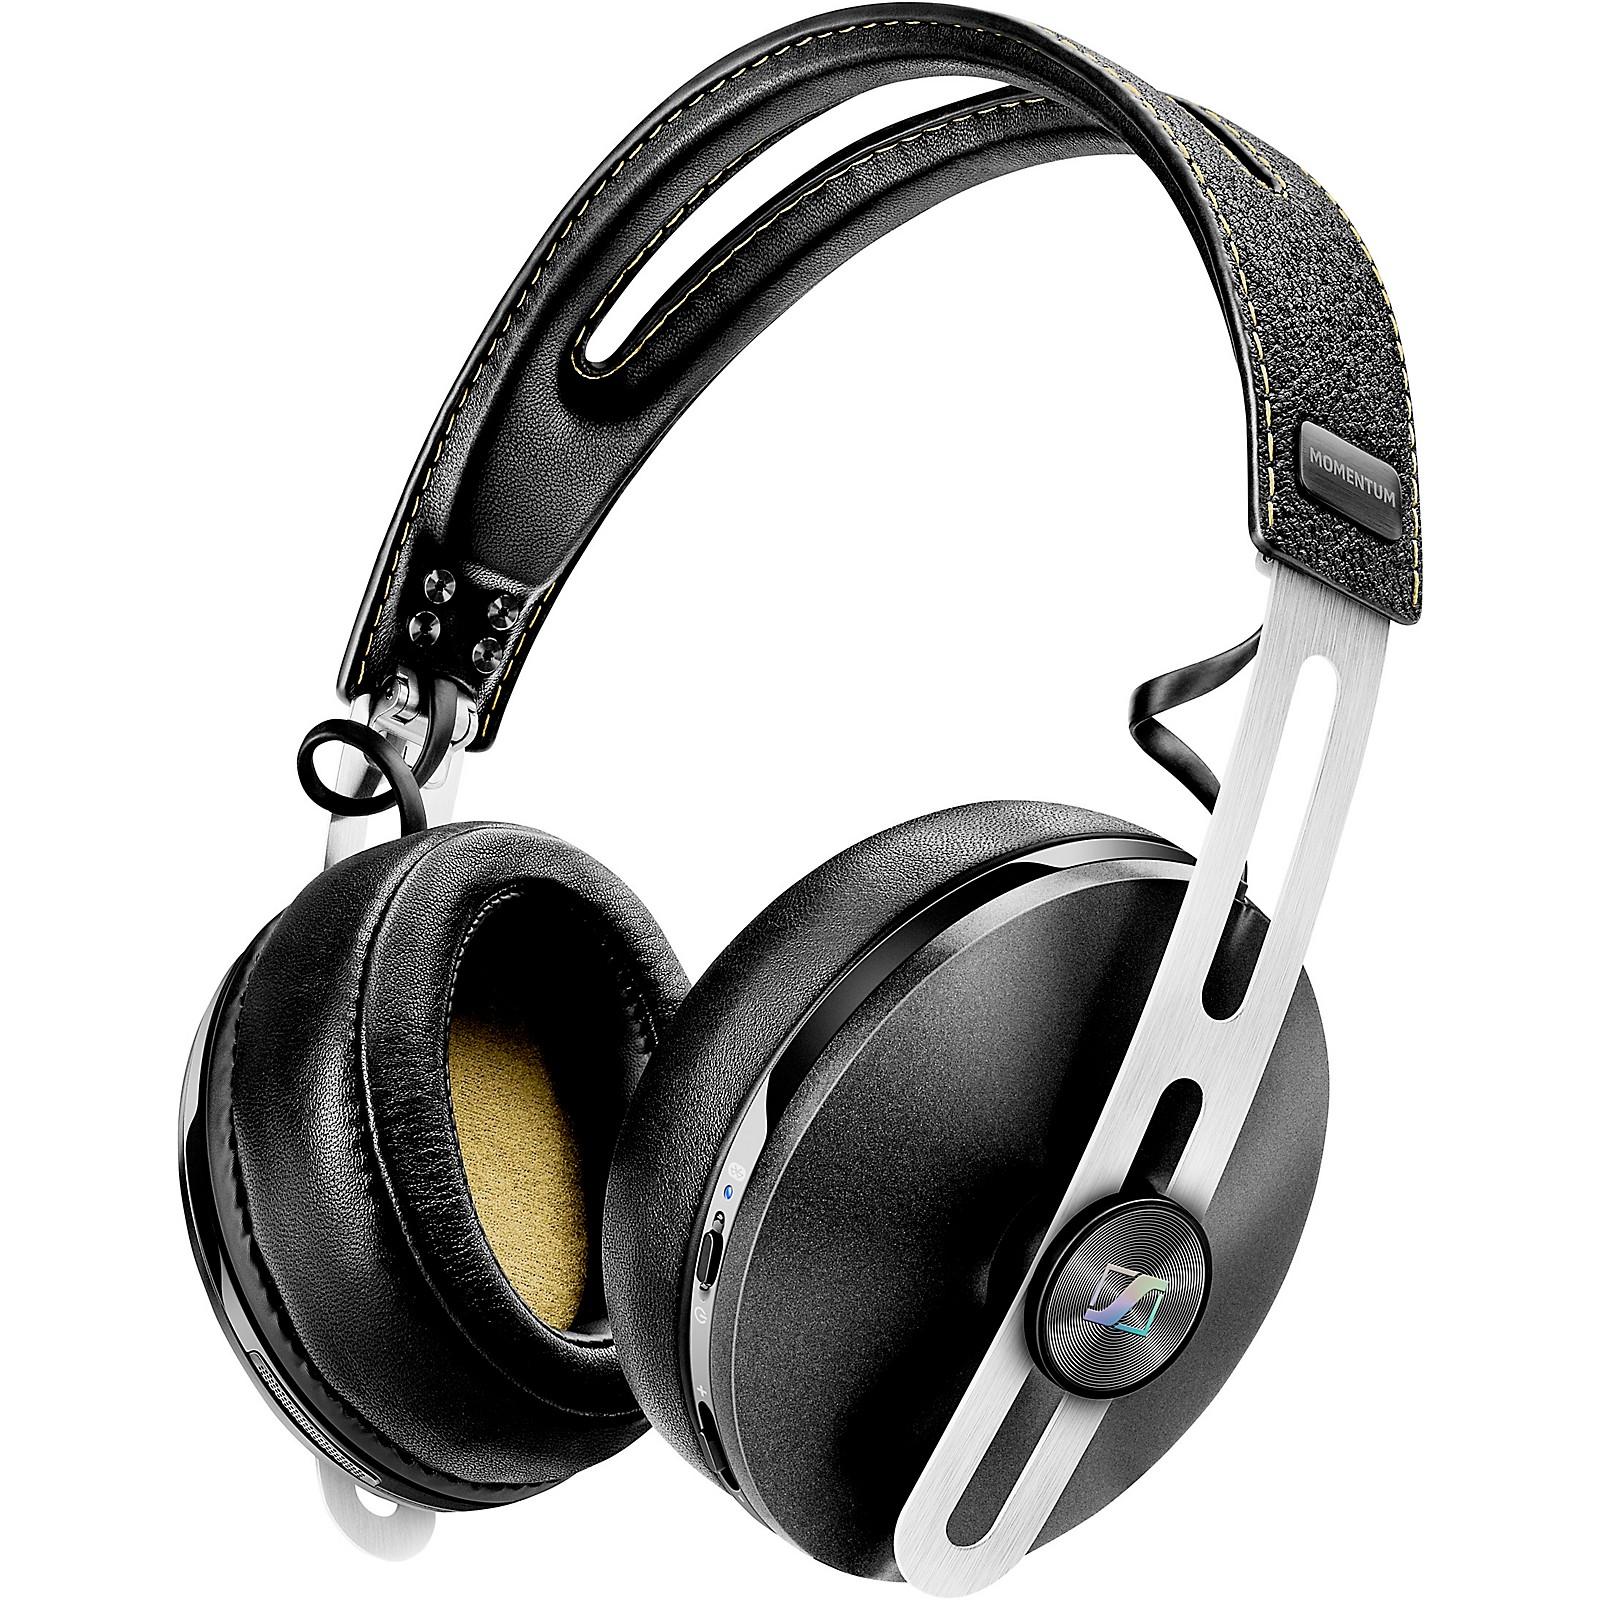 Open Box Sennheiser Momentum (M2) Wireless Around-Ear Headphones